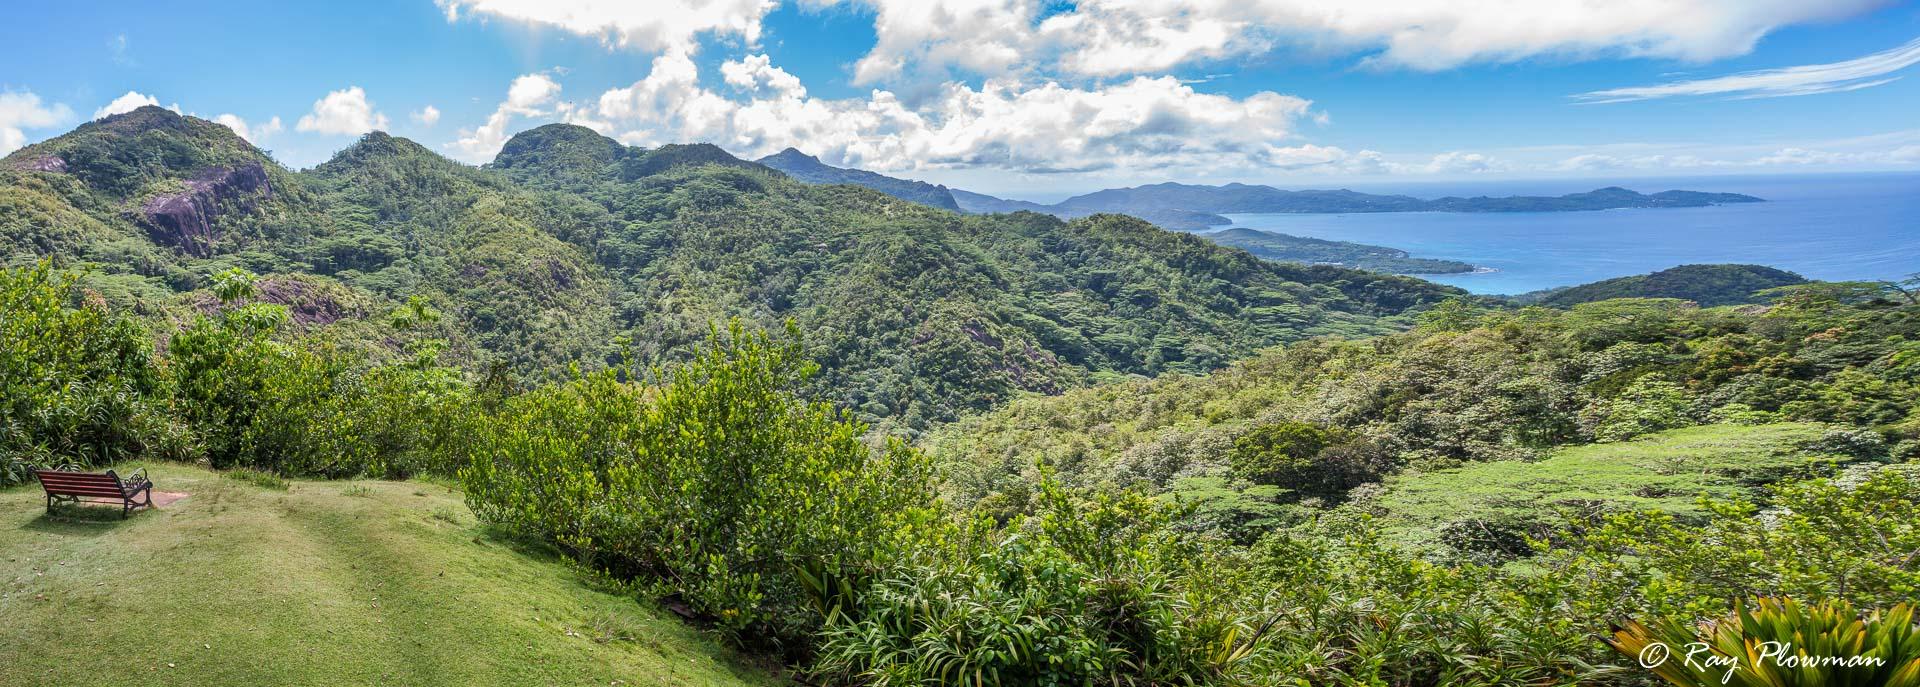 North Mahé Nature Travel